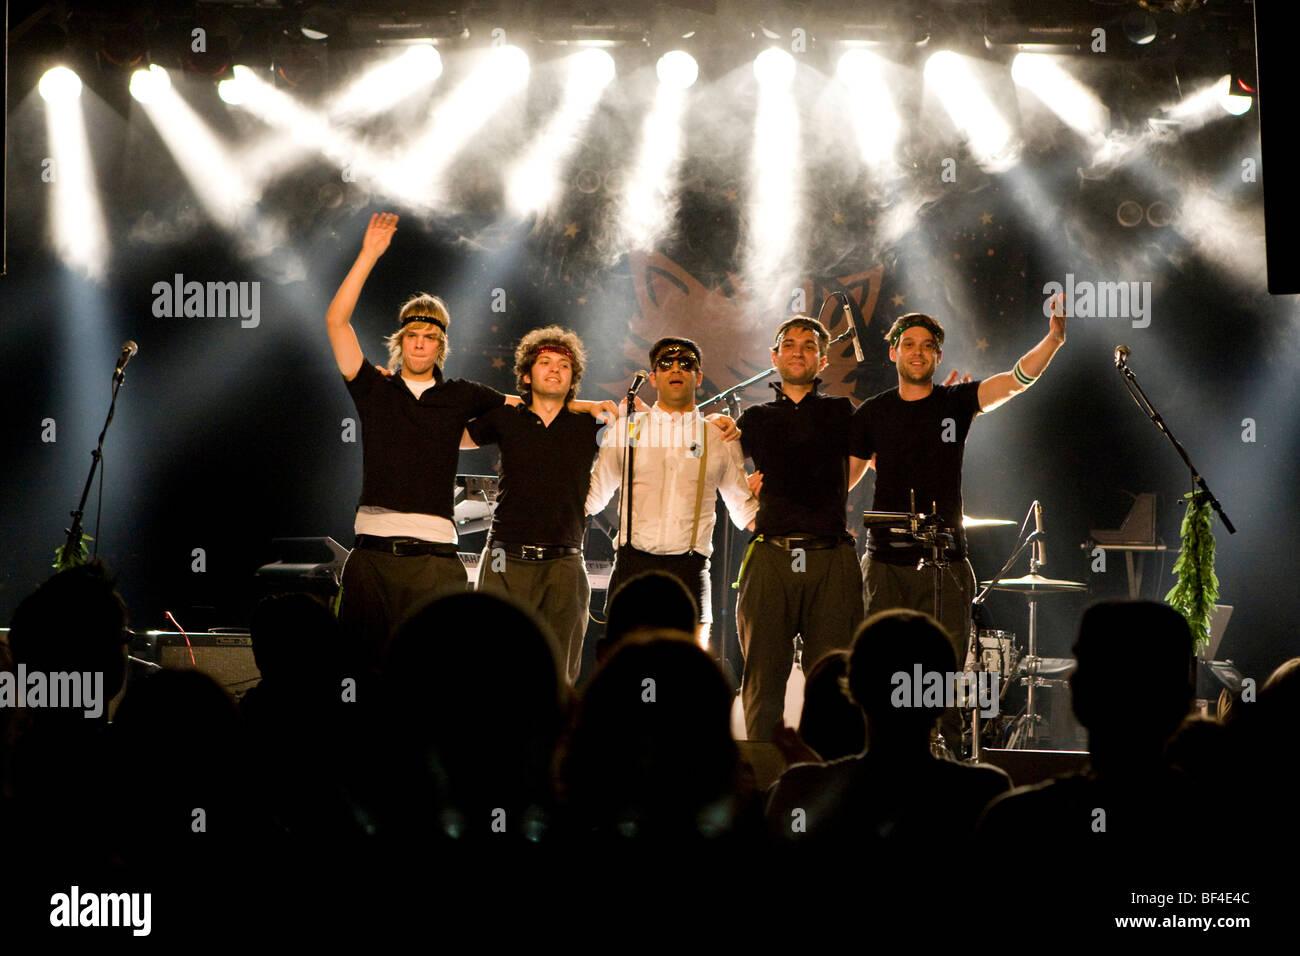 La band tedesca timida Tiger live in Schueuer concert hall, Lucerna, Svizzera Immagini Stock